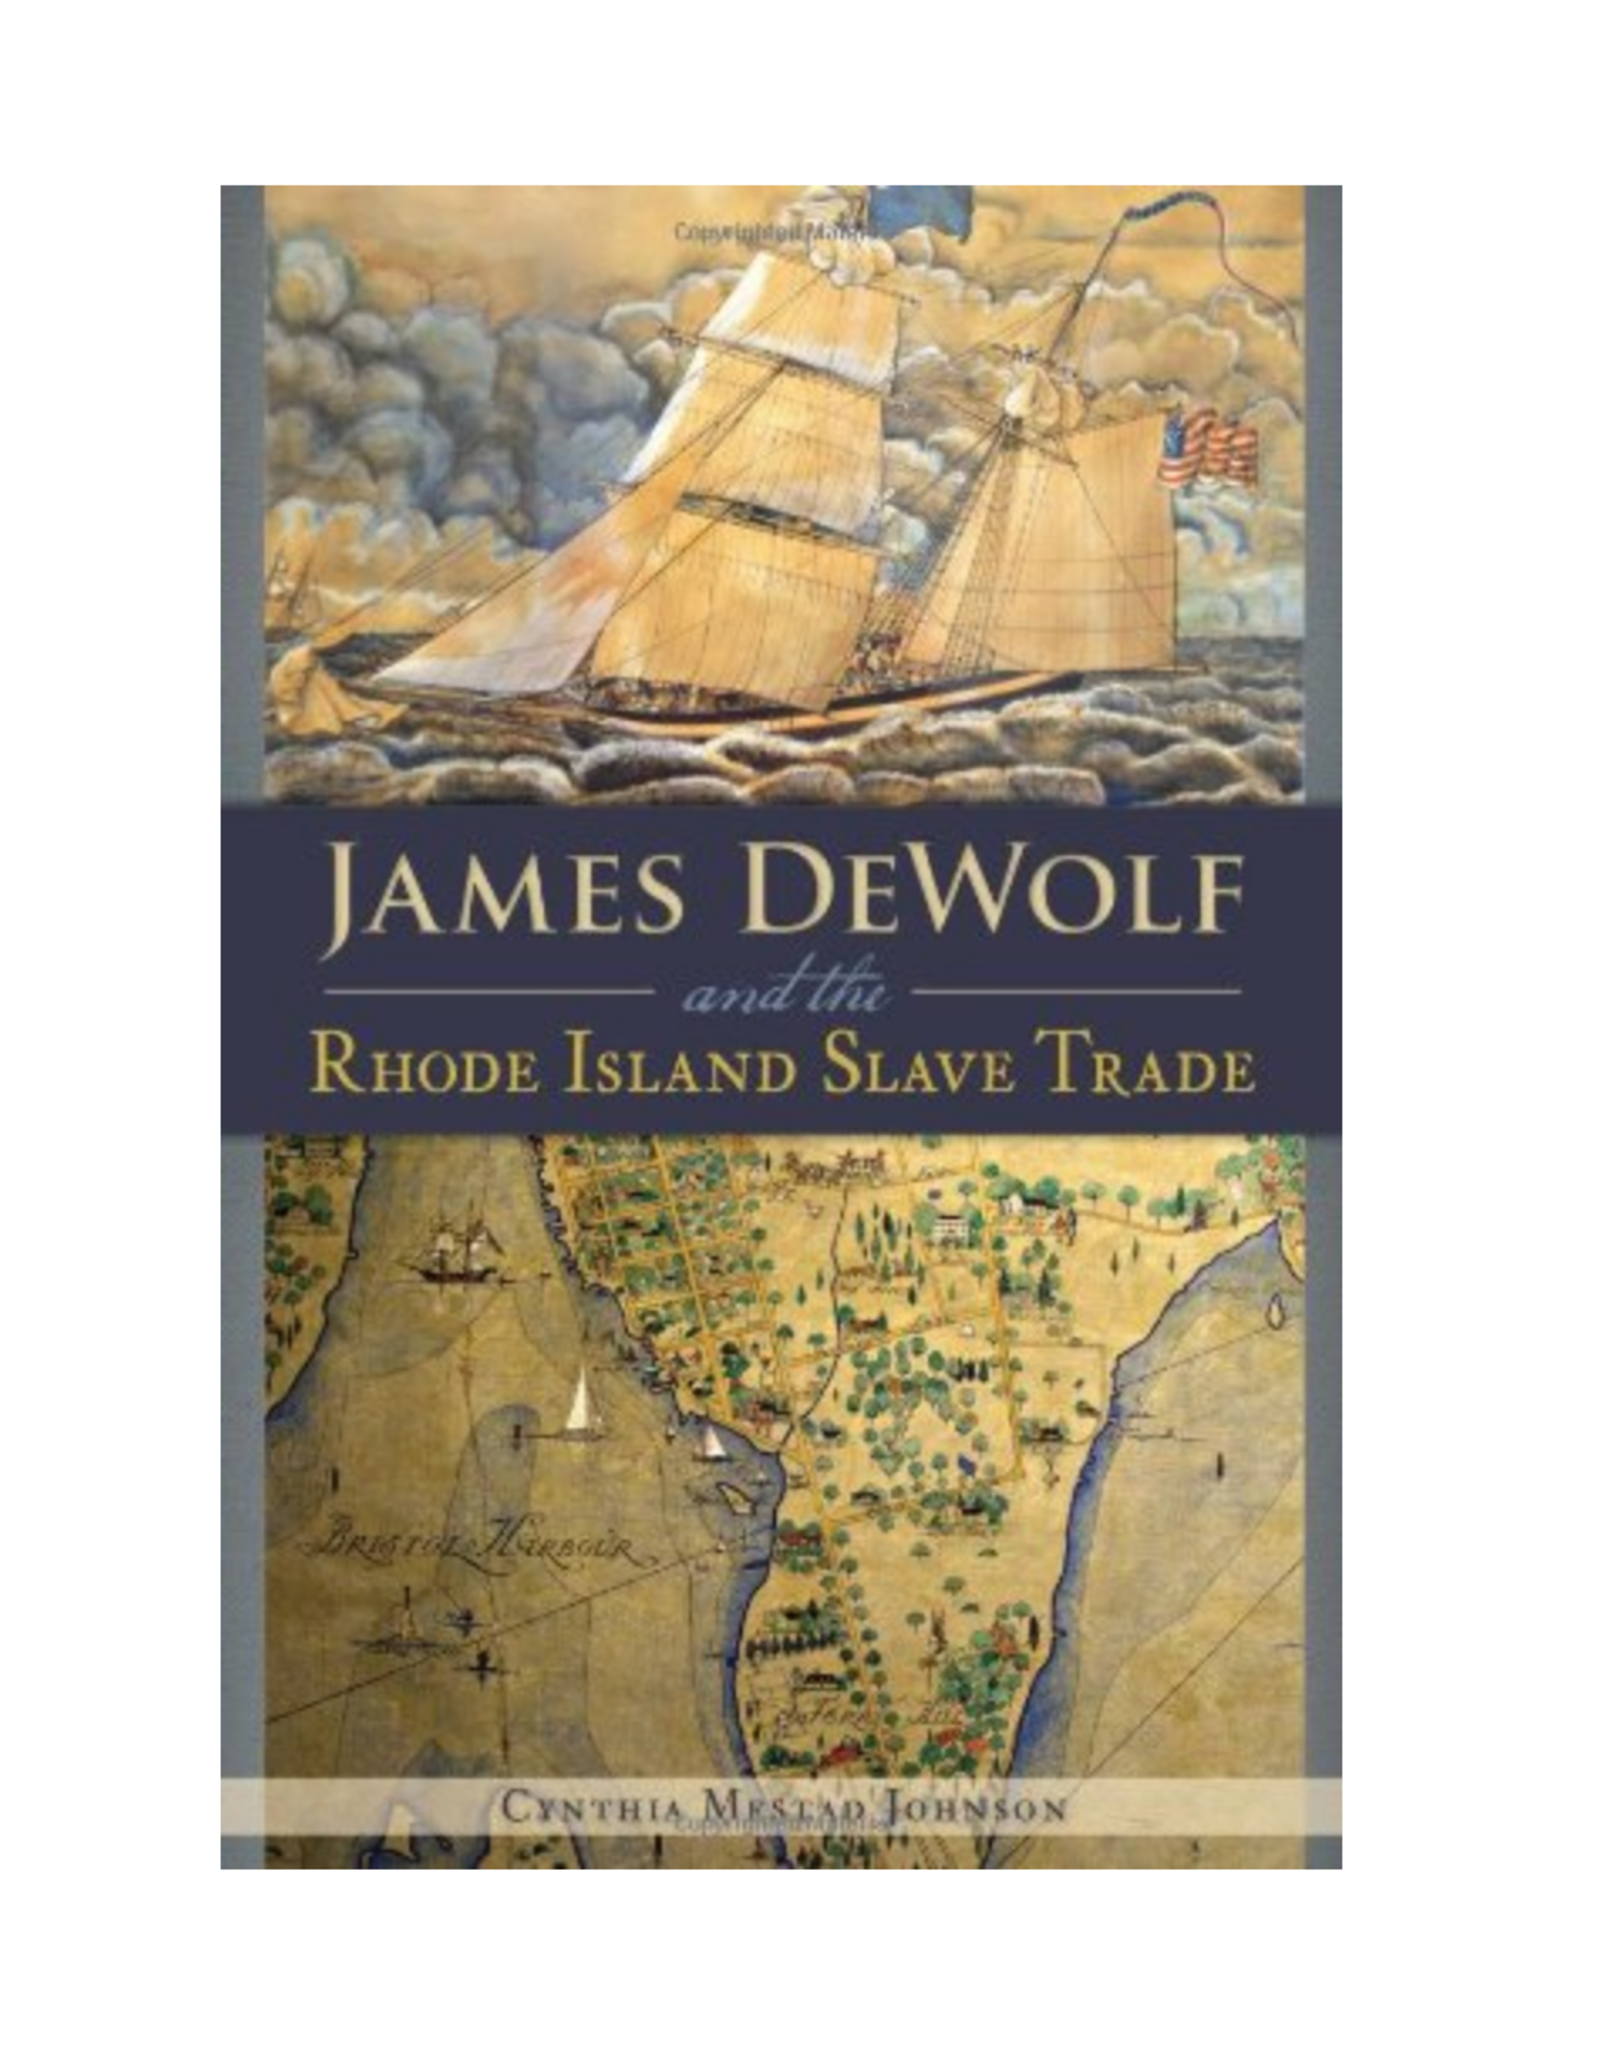 James Dewolf & the RI Slave Trade